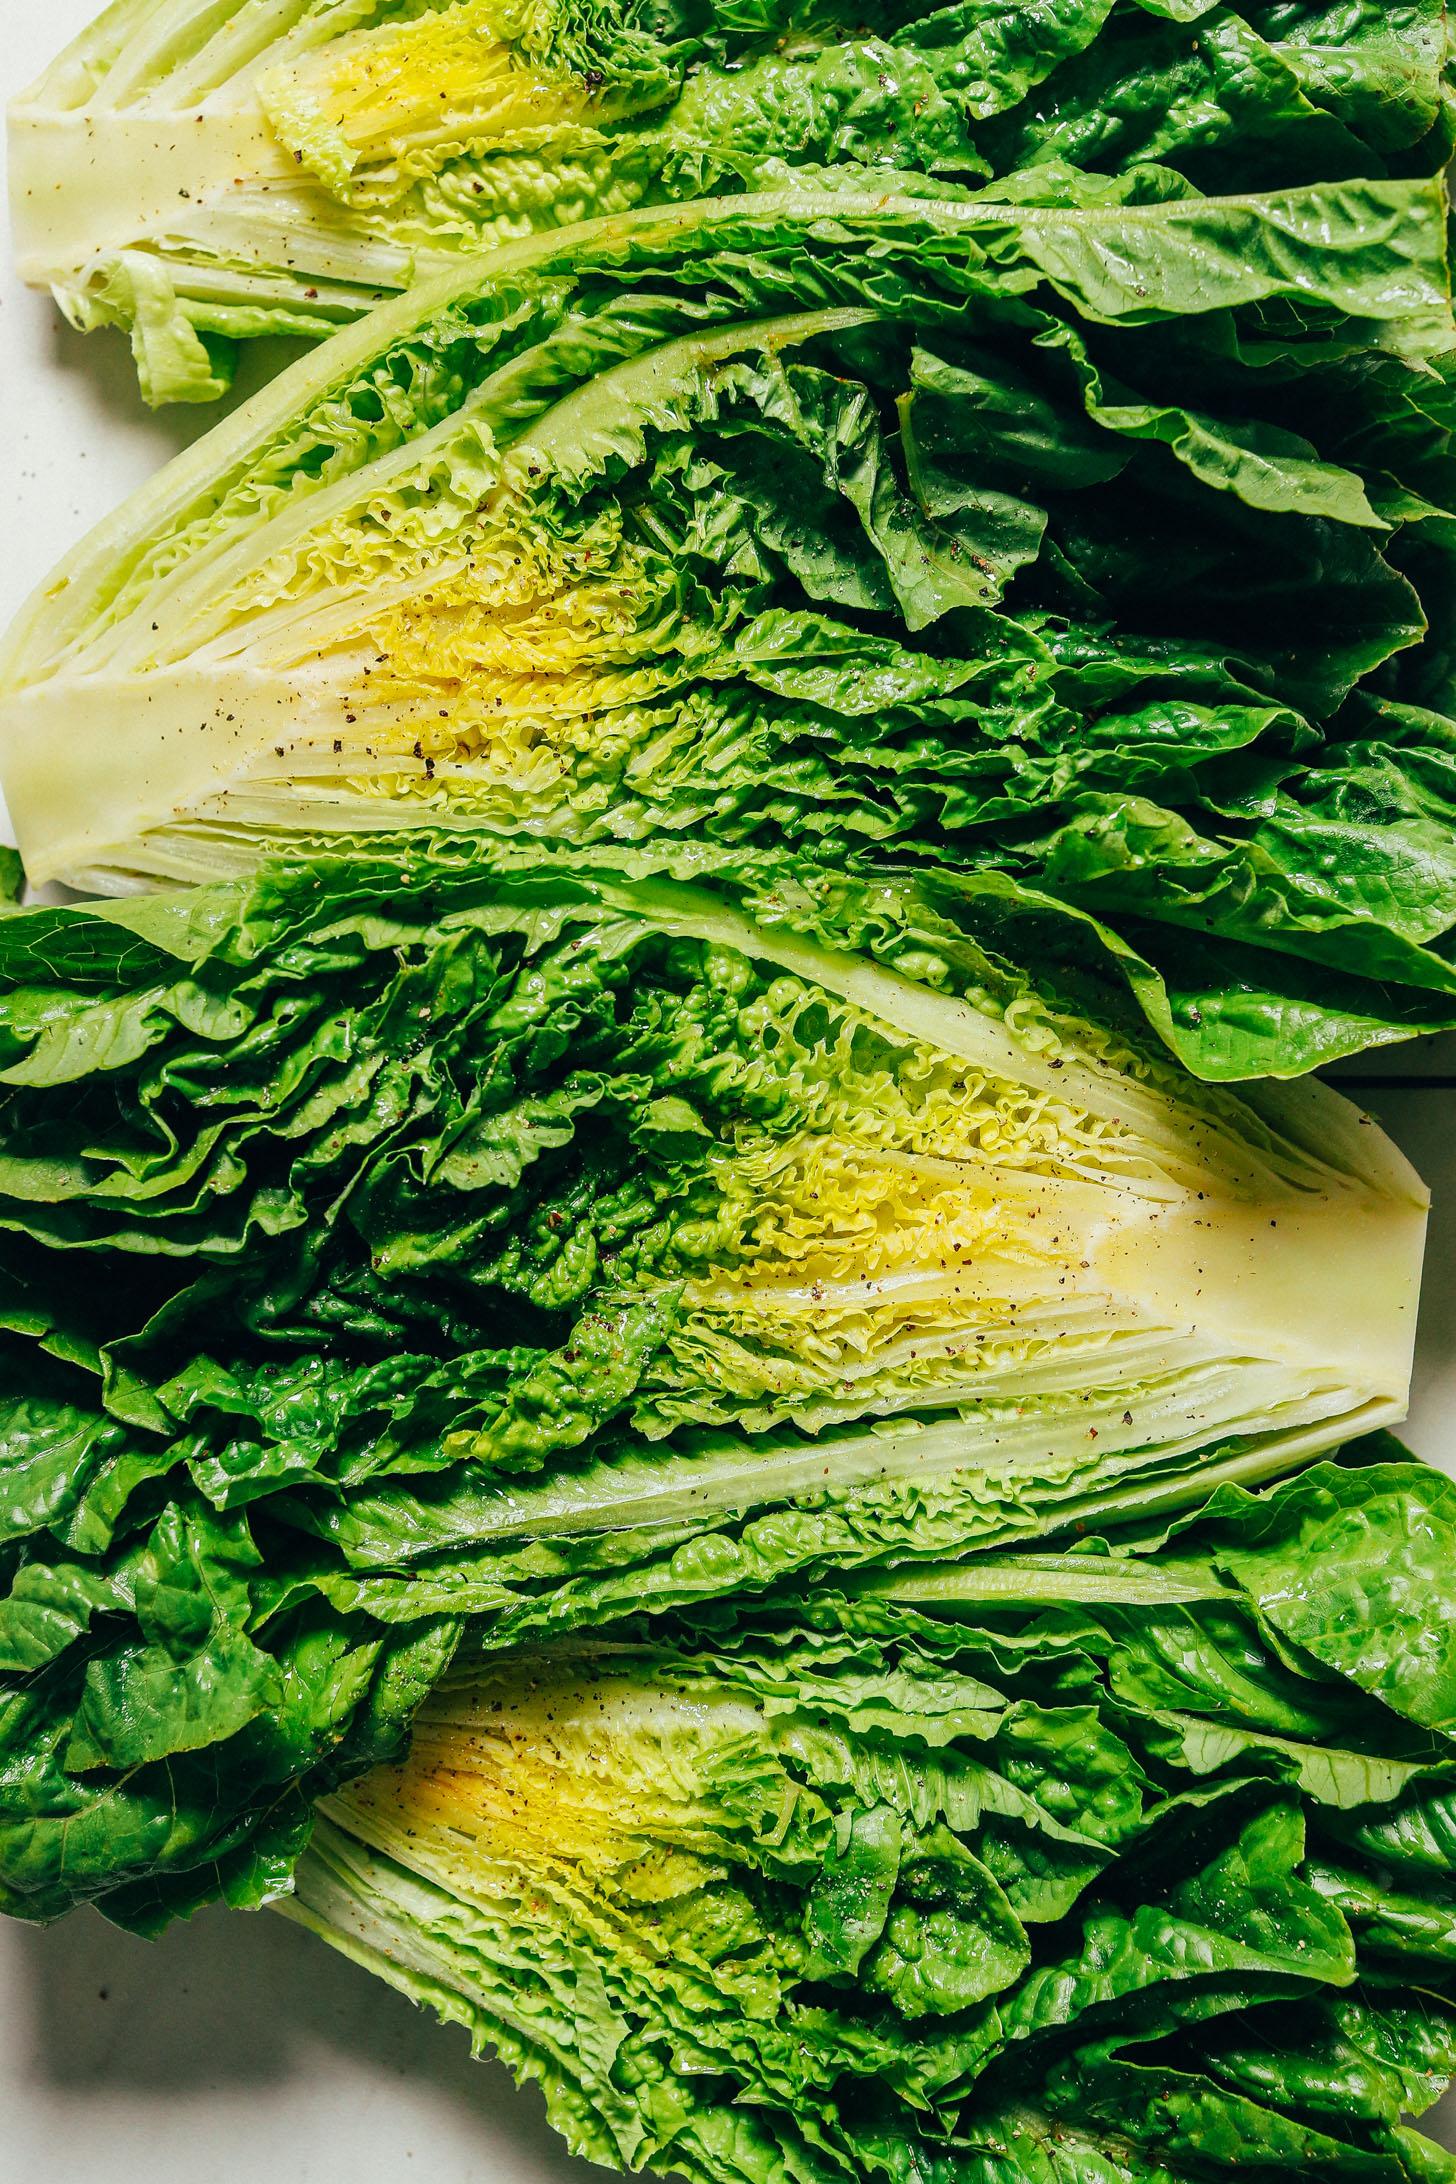 Halved heads of romaine lettuce sprinkled with black pepper